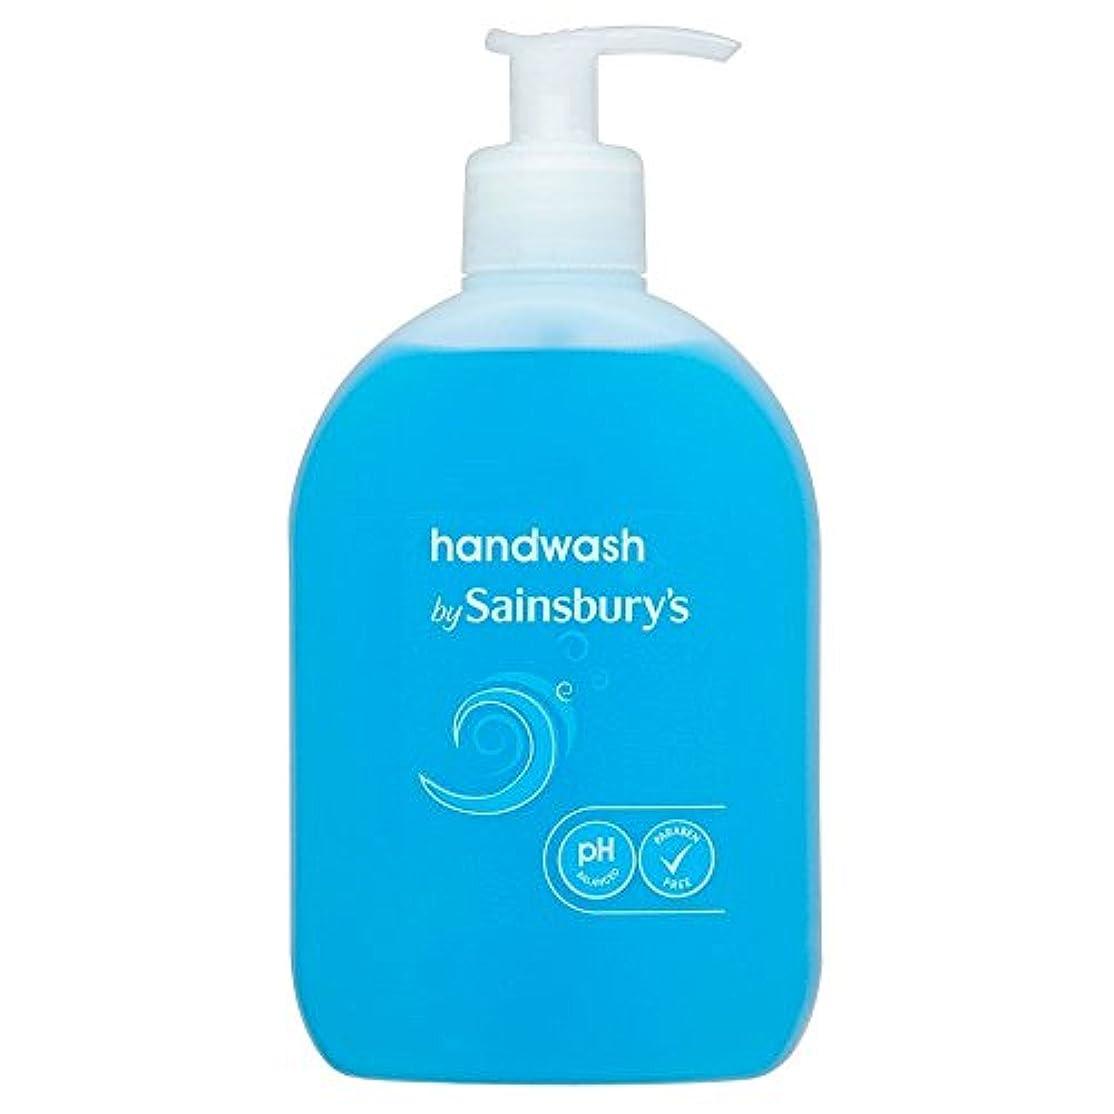 Sainsbury's Handwash, Blue 500ml (Pack of 2) - (Sainsbury's) 手洗い、青500ミリリットル (x2) [並行輸入品]